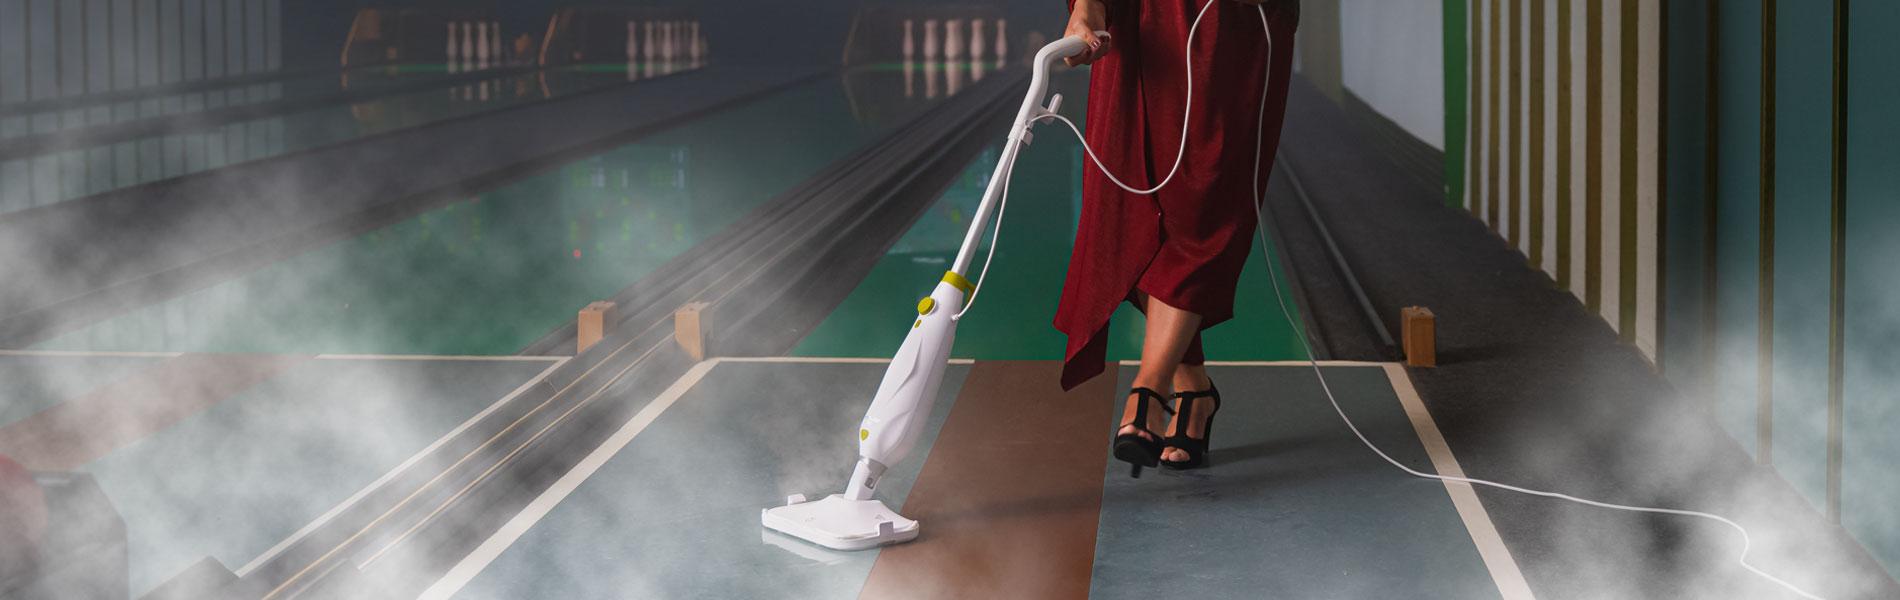 Dubinsko čišćenje nano parom!